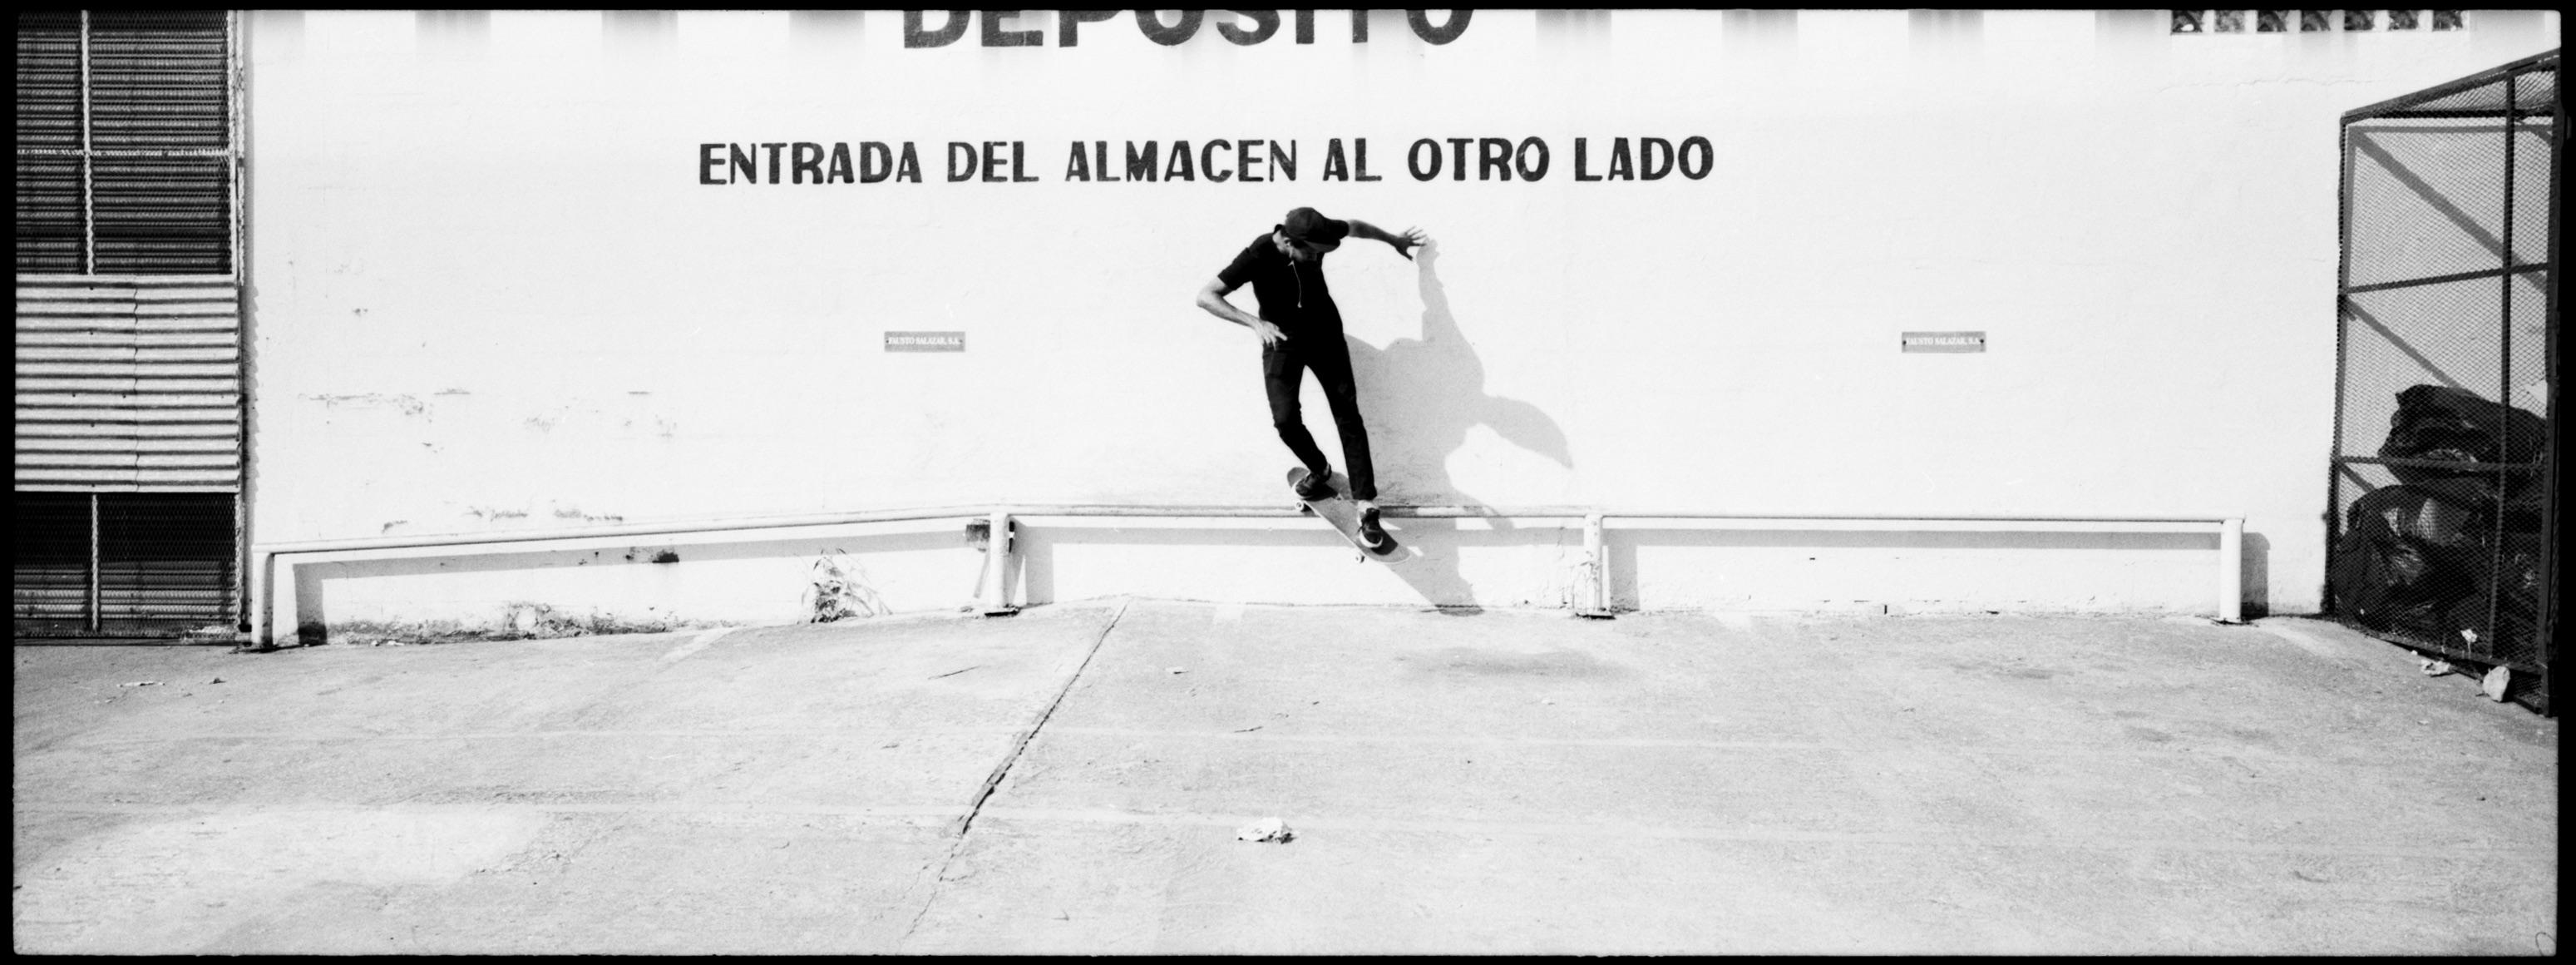 Rafael Gonzalez 12 - Andres Sanders - Backside Smith 1